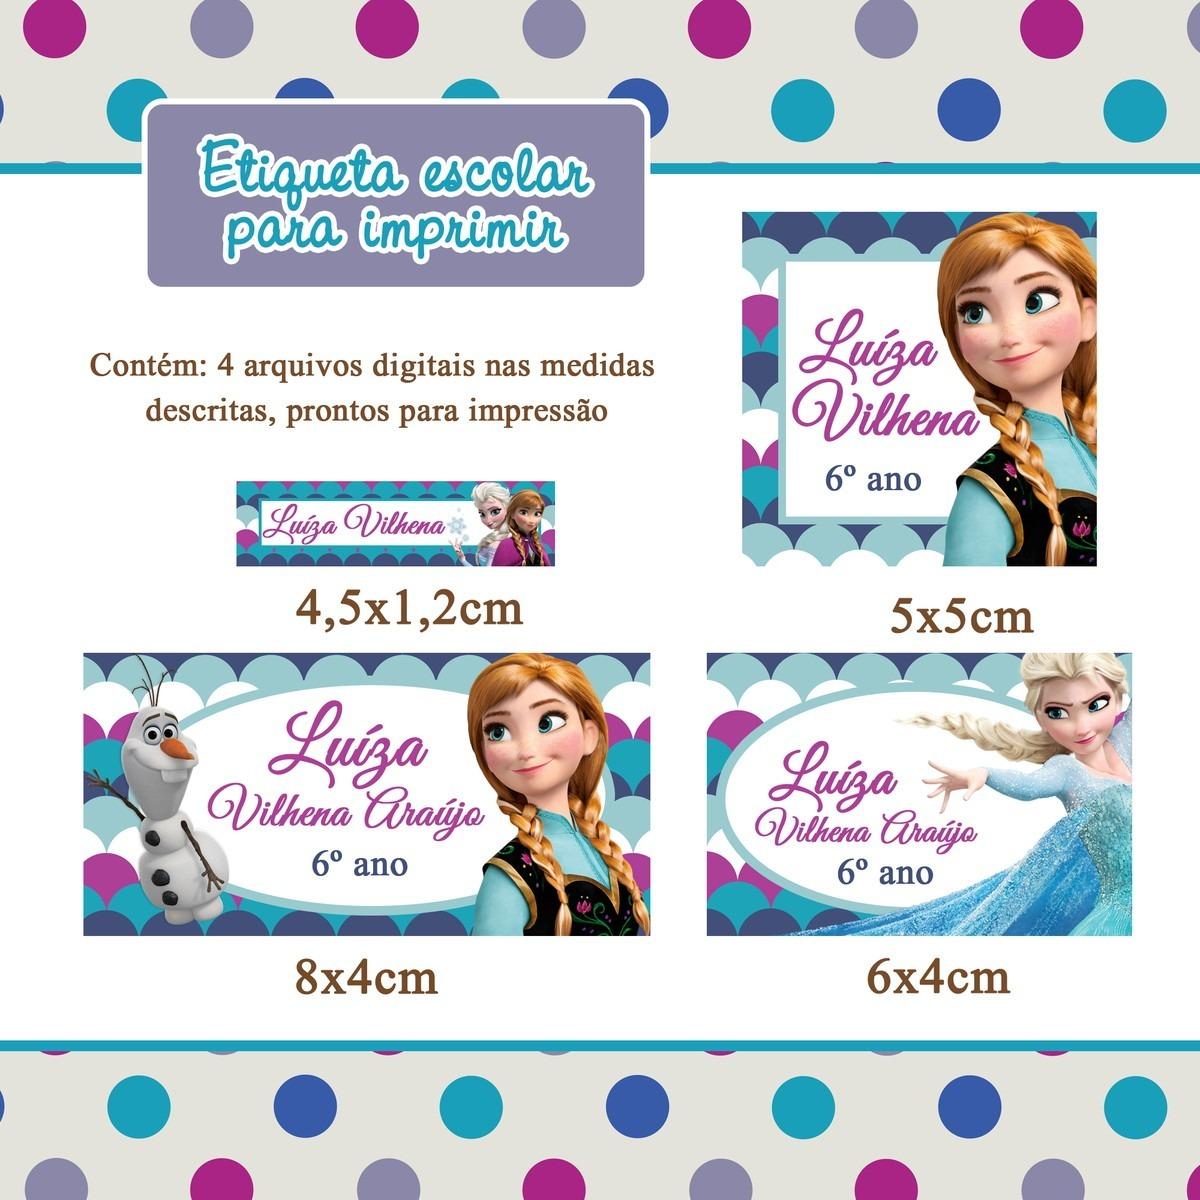 Etiquetas escolares para imprimir personalizadas r 15 for Medidas de mobiliario escolar inicial